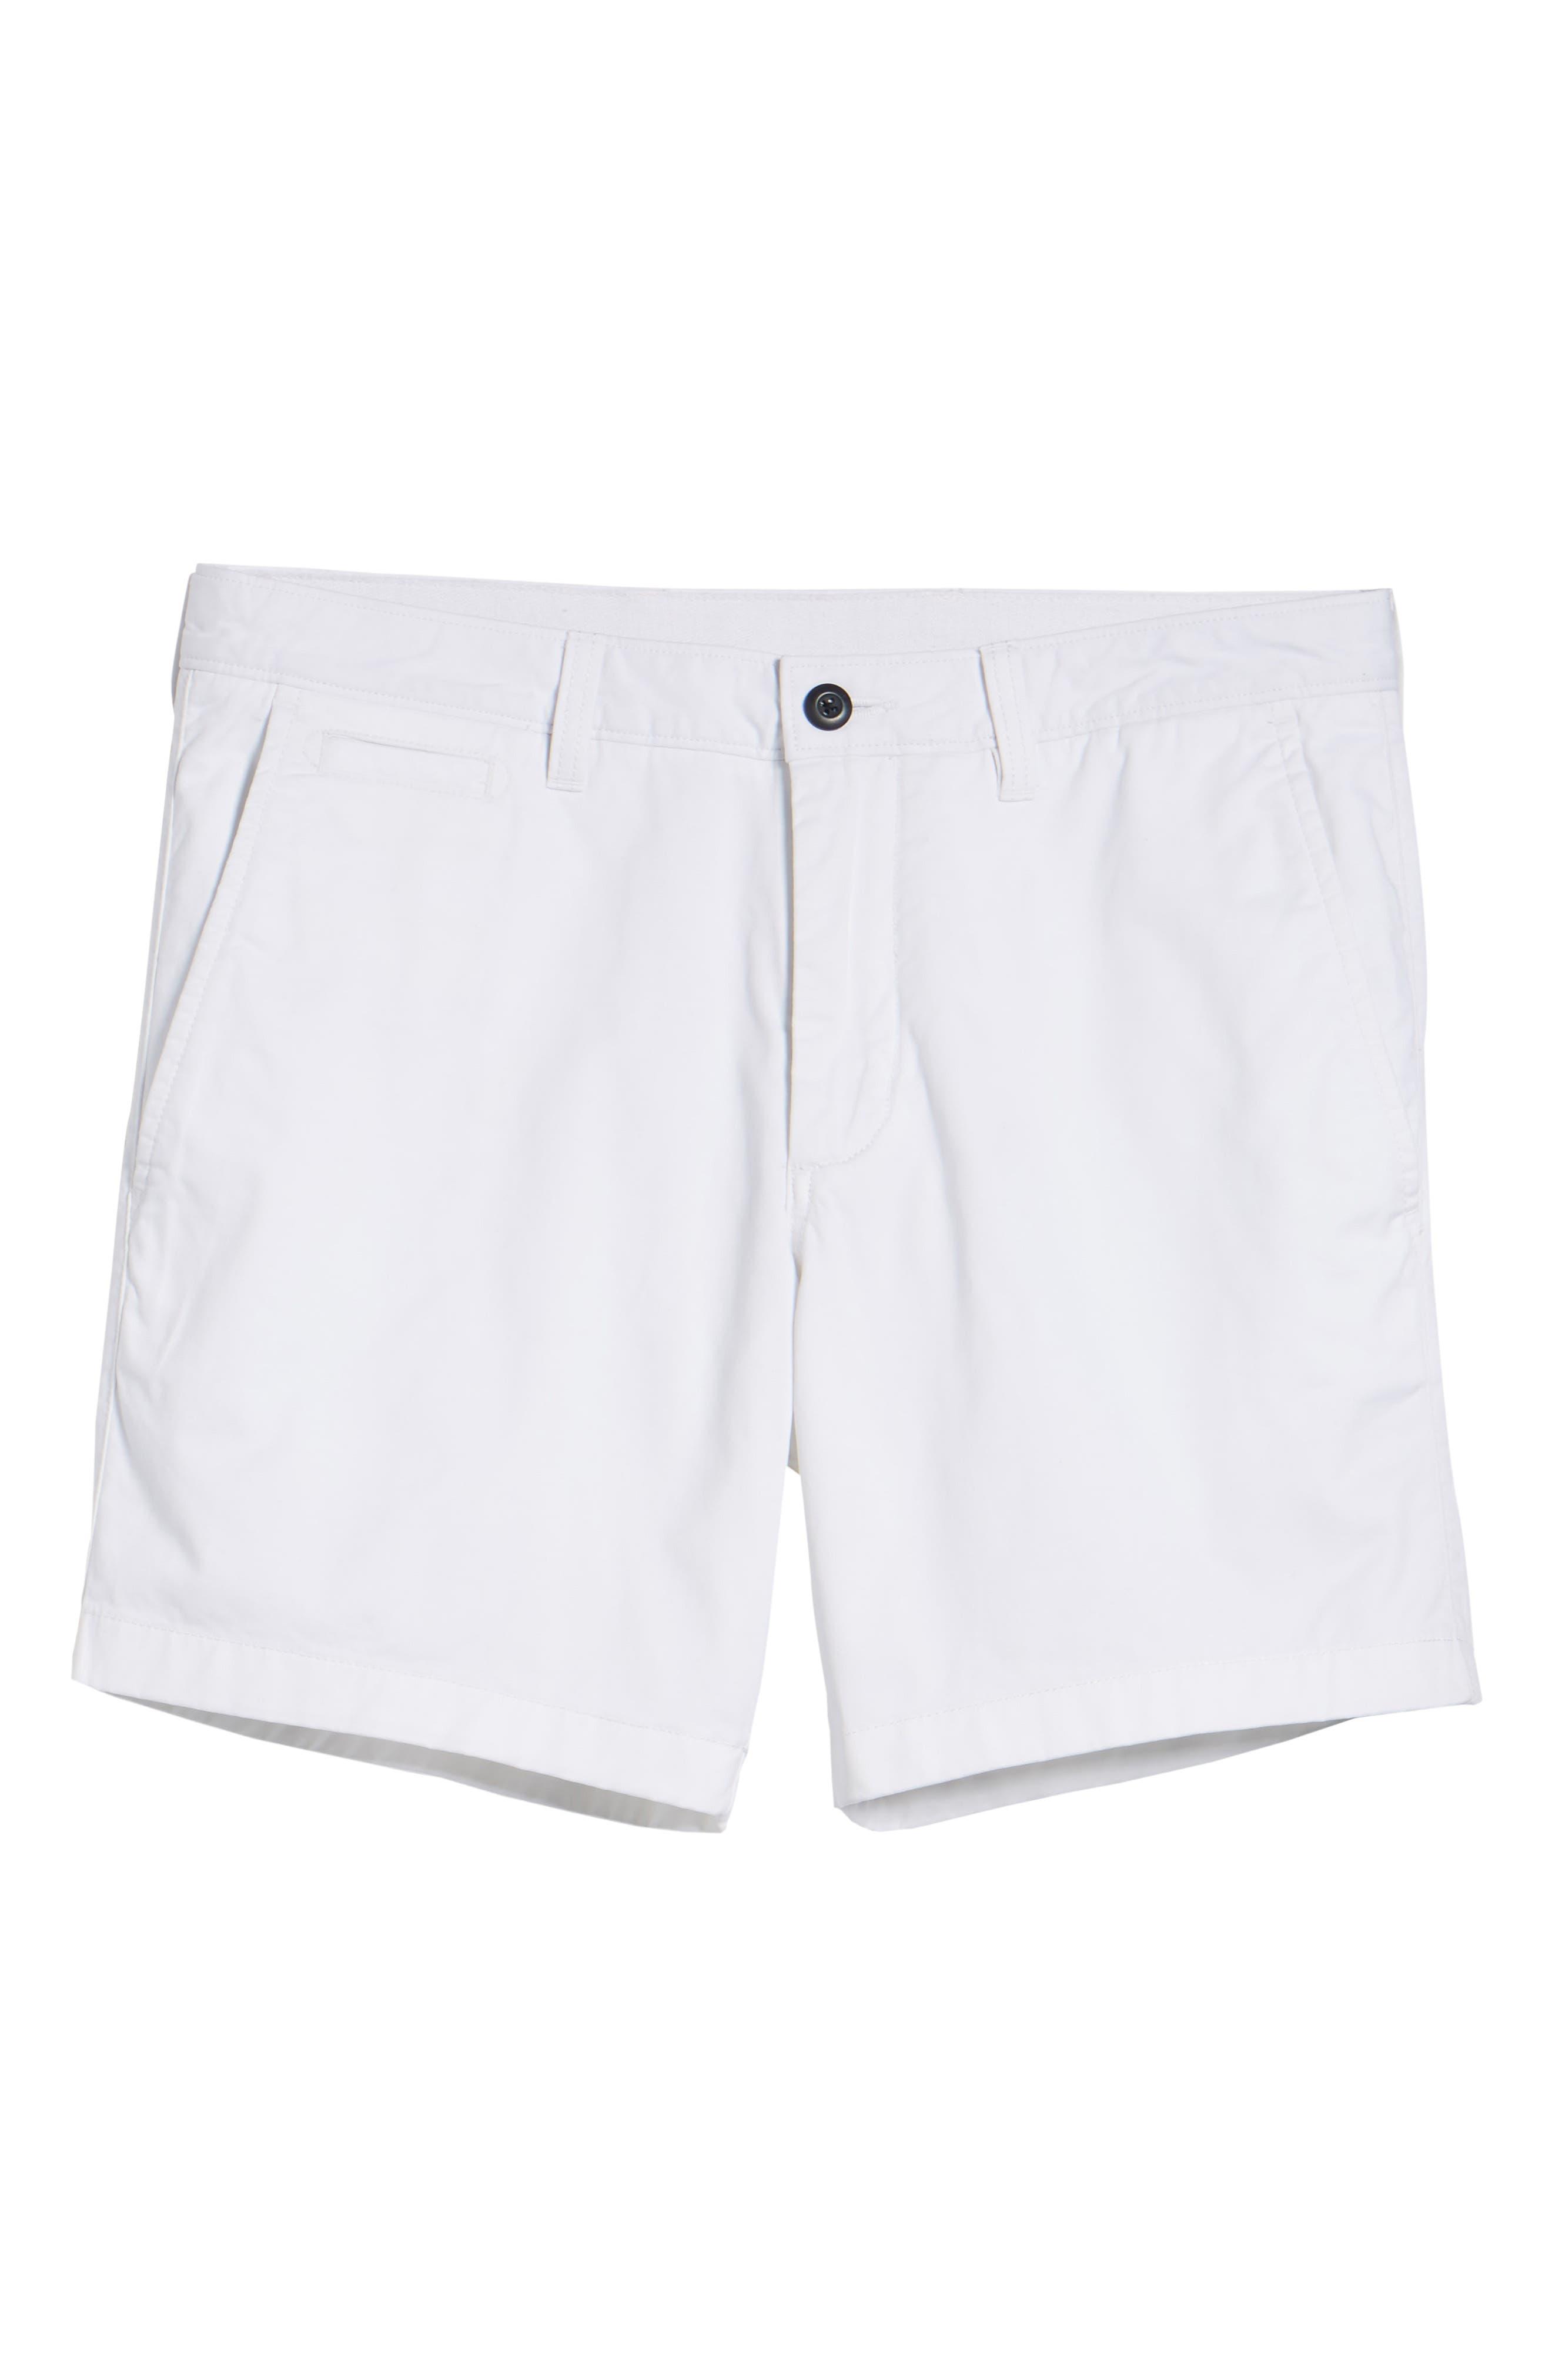 Ballard Slim Fit Stretch Chino 7-Inch Shorts,                             Alternate thumbnail 62, color,